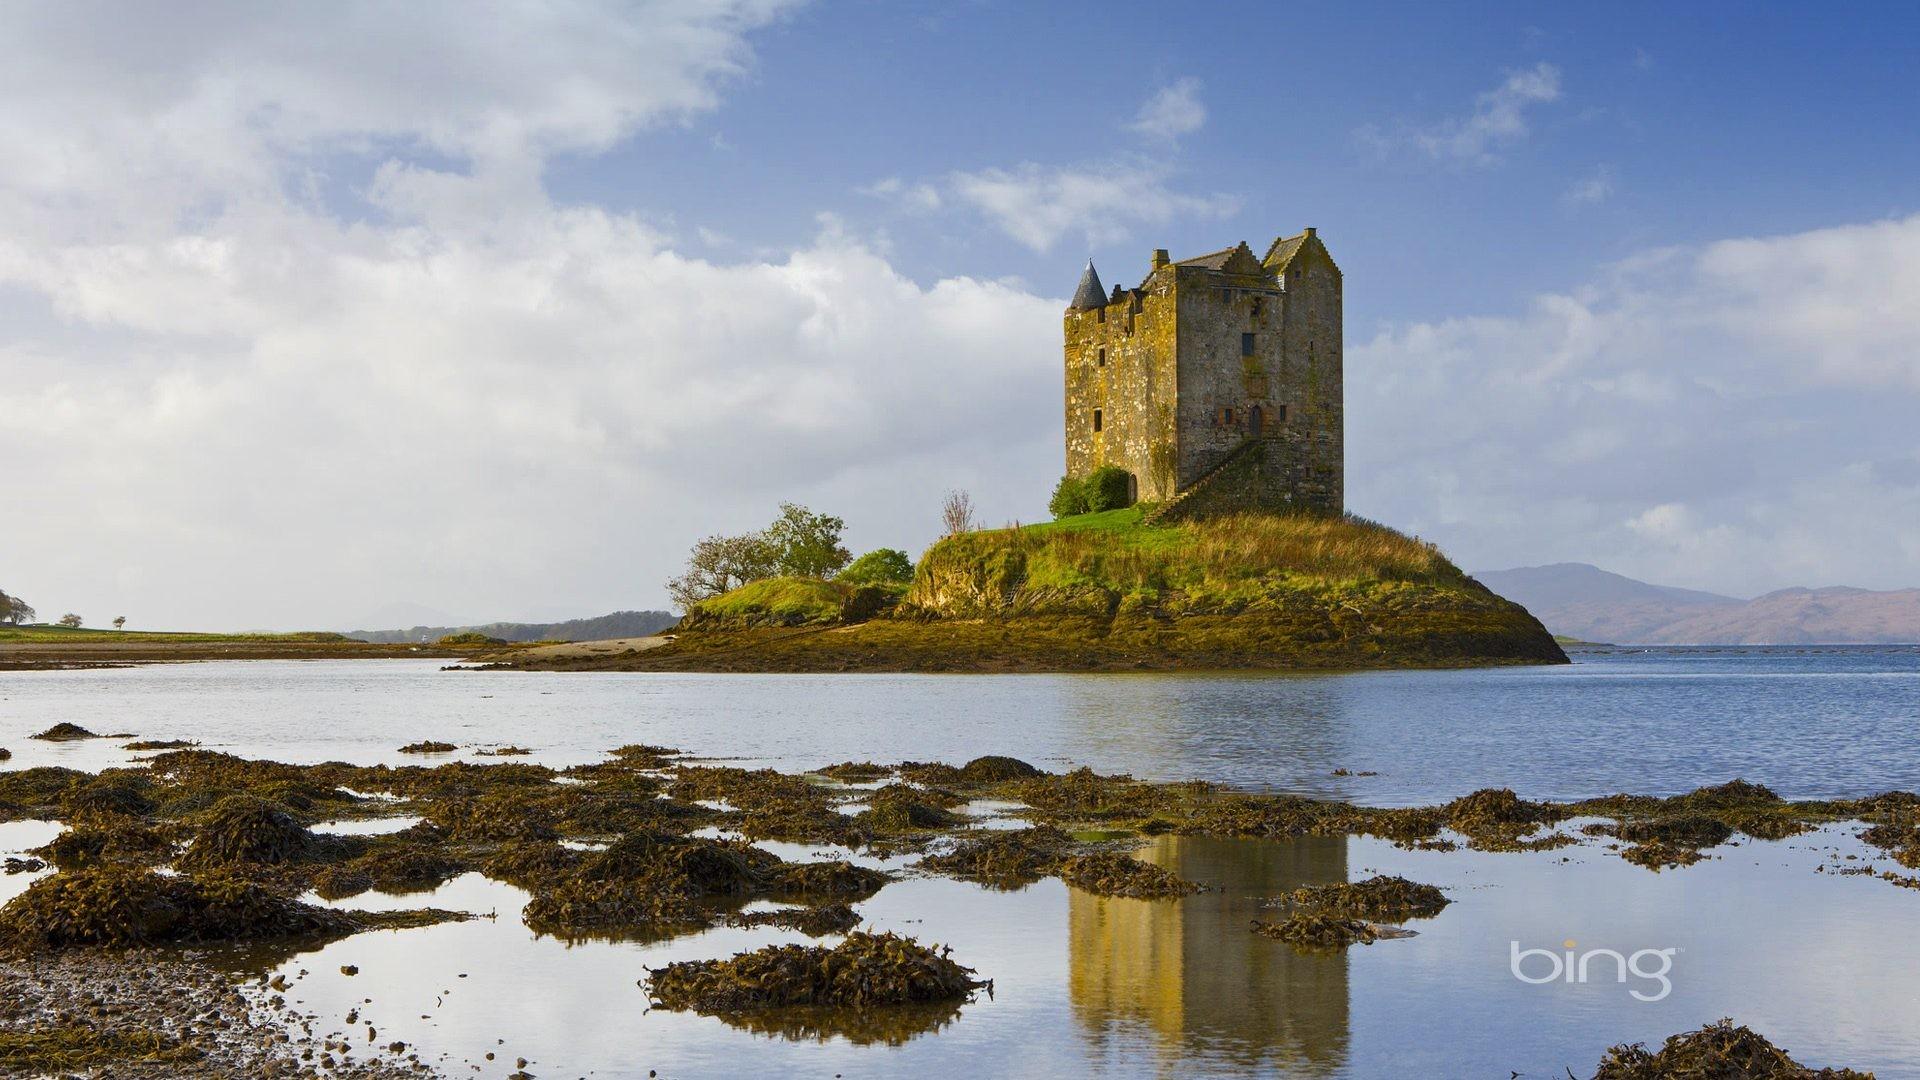 Medieval – Bing Best Stalker Castle Microsoft Lake Search Fullscreen  Wallpaper for HD 16:9